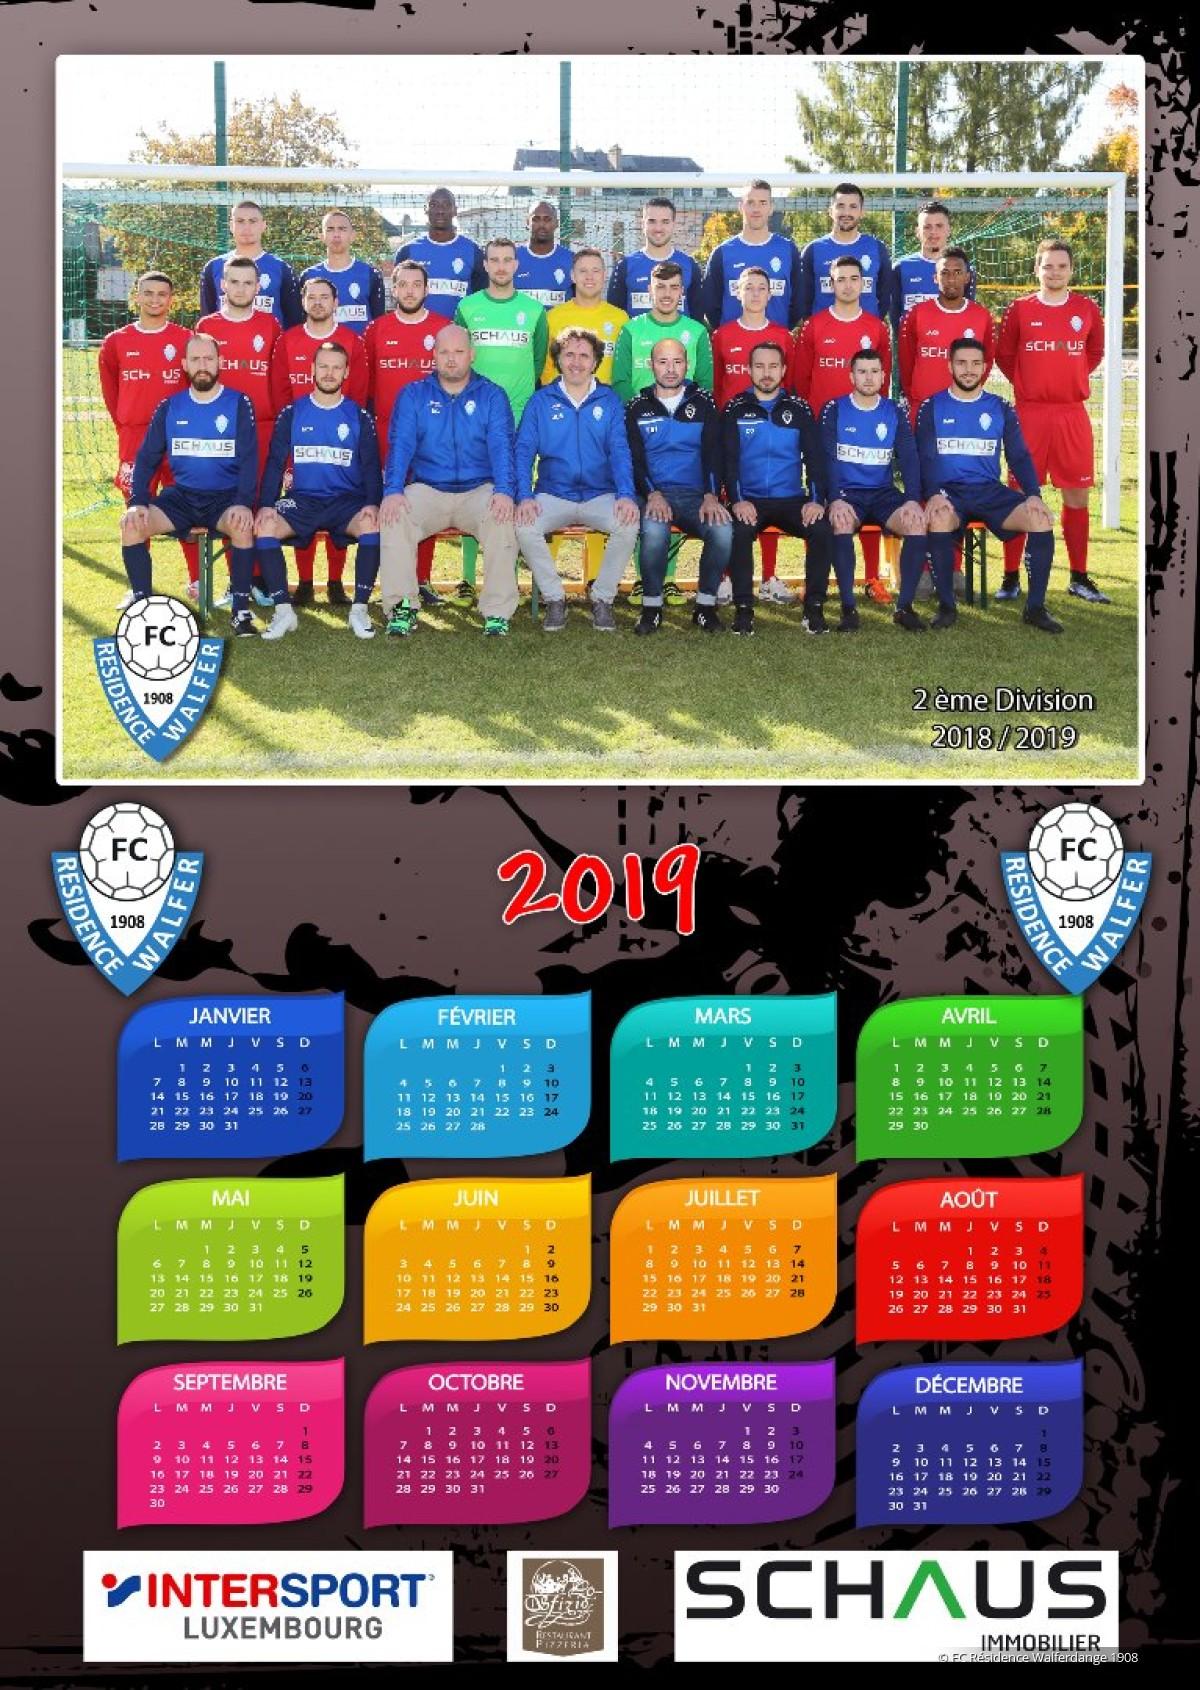 1/01/2019 Calendriers équipes (Photos J. Bourgeois)